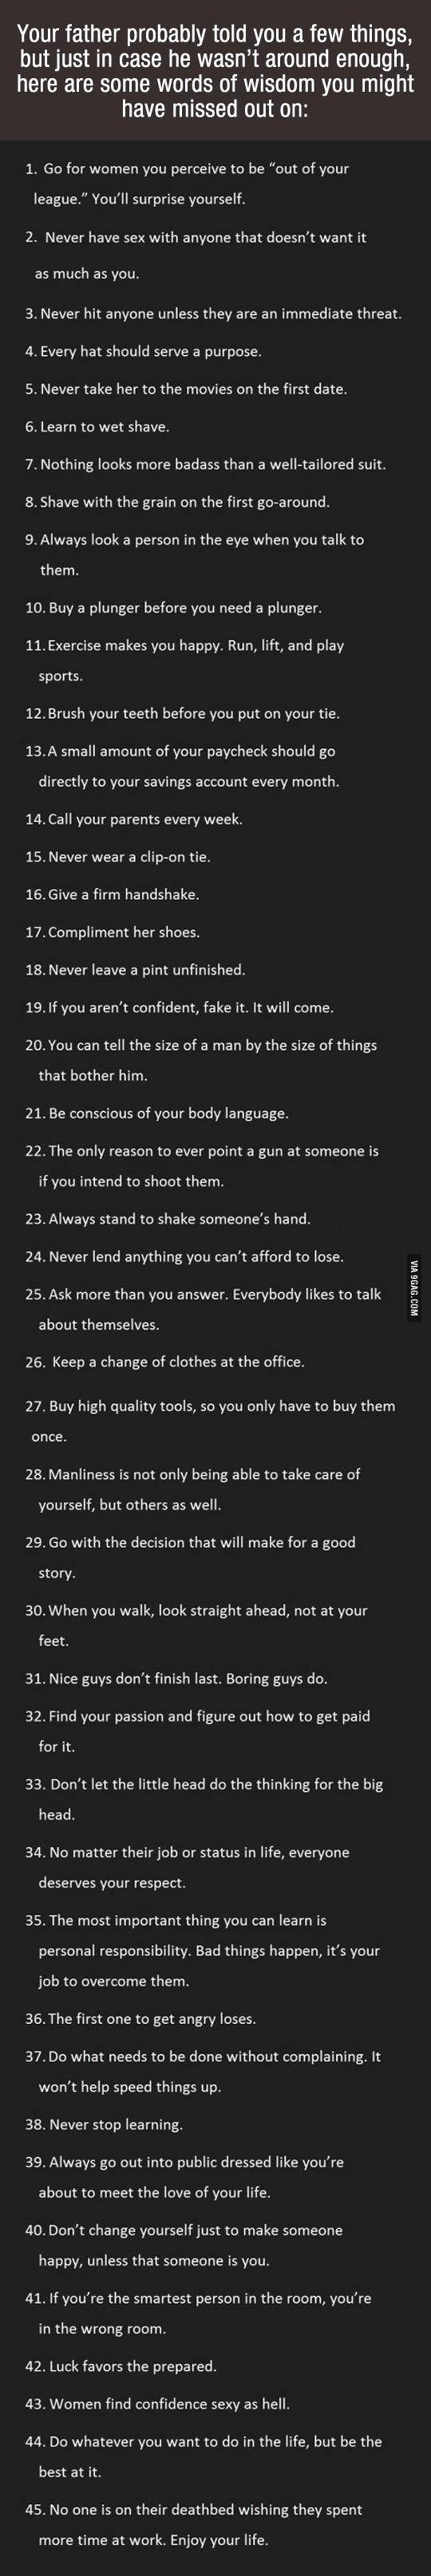 Some good advice.